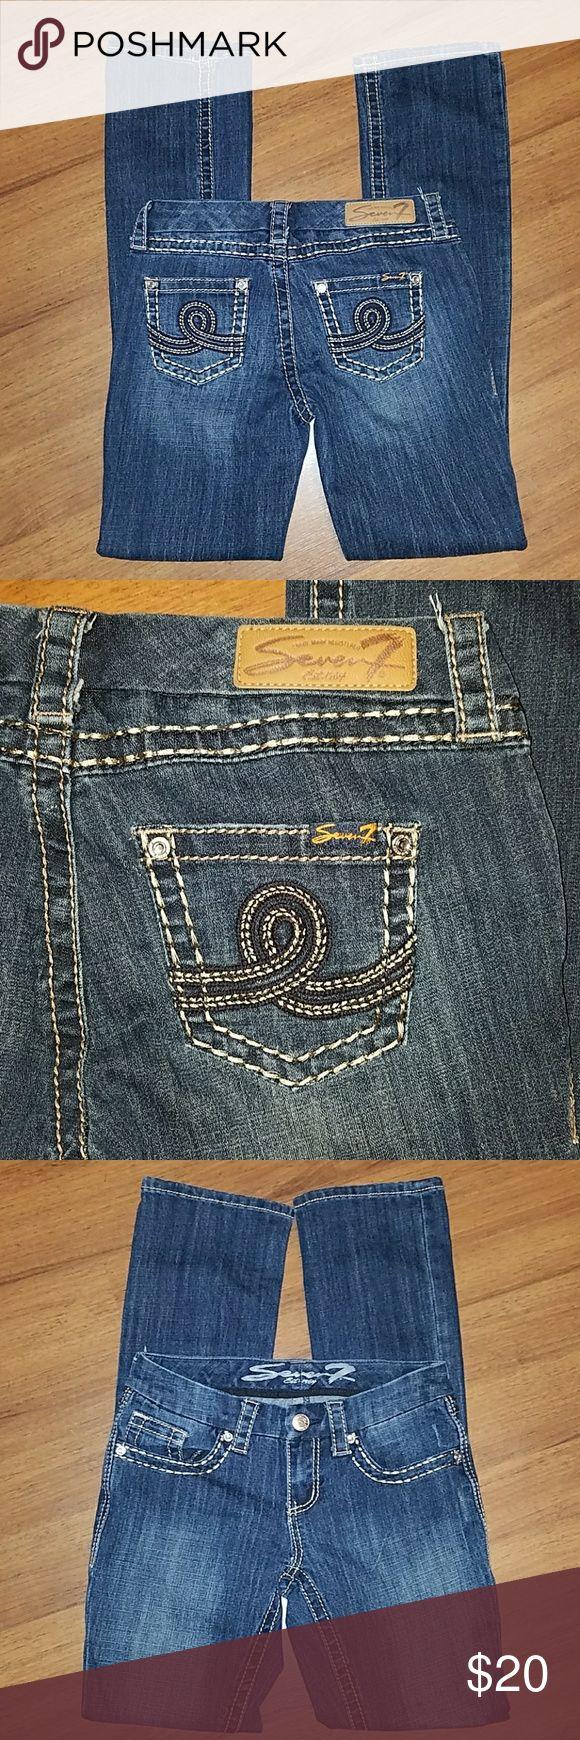 Seven7 Jeans size 2 slim bootcut Seven7 Jeans size 2 slim bootcut. Inseam is 31 inches. Seven7 Jeans Boot Cut